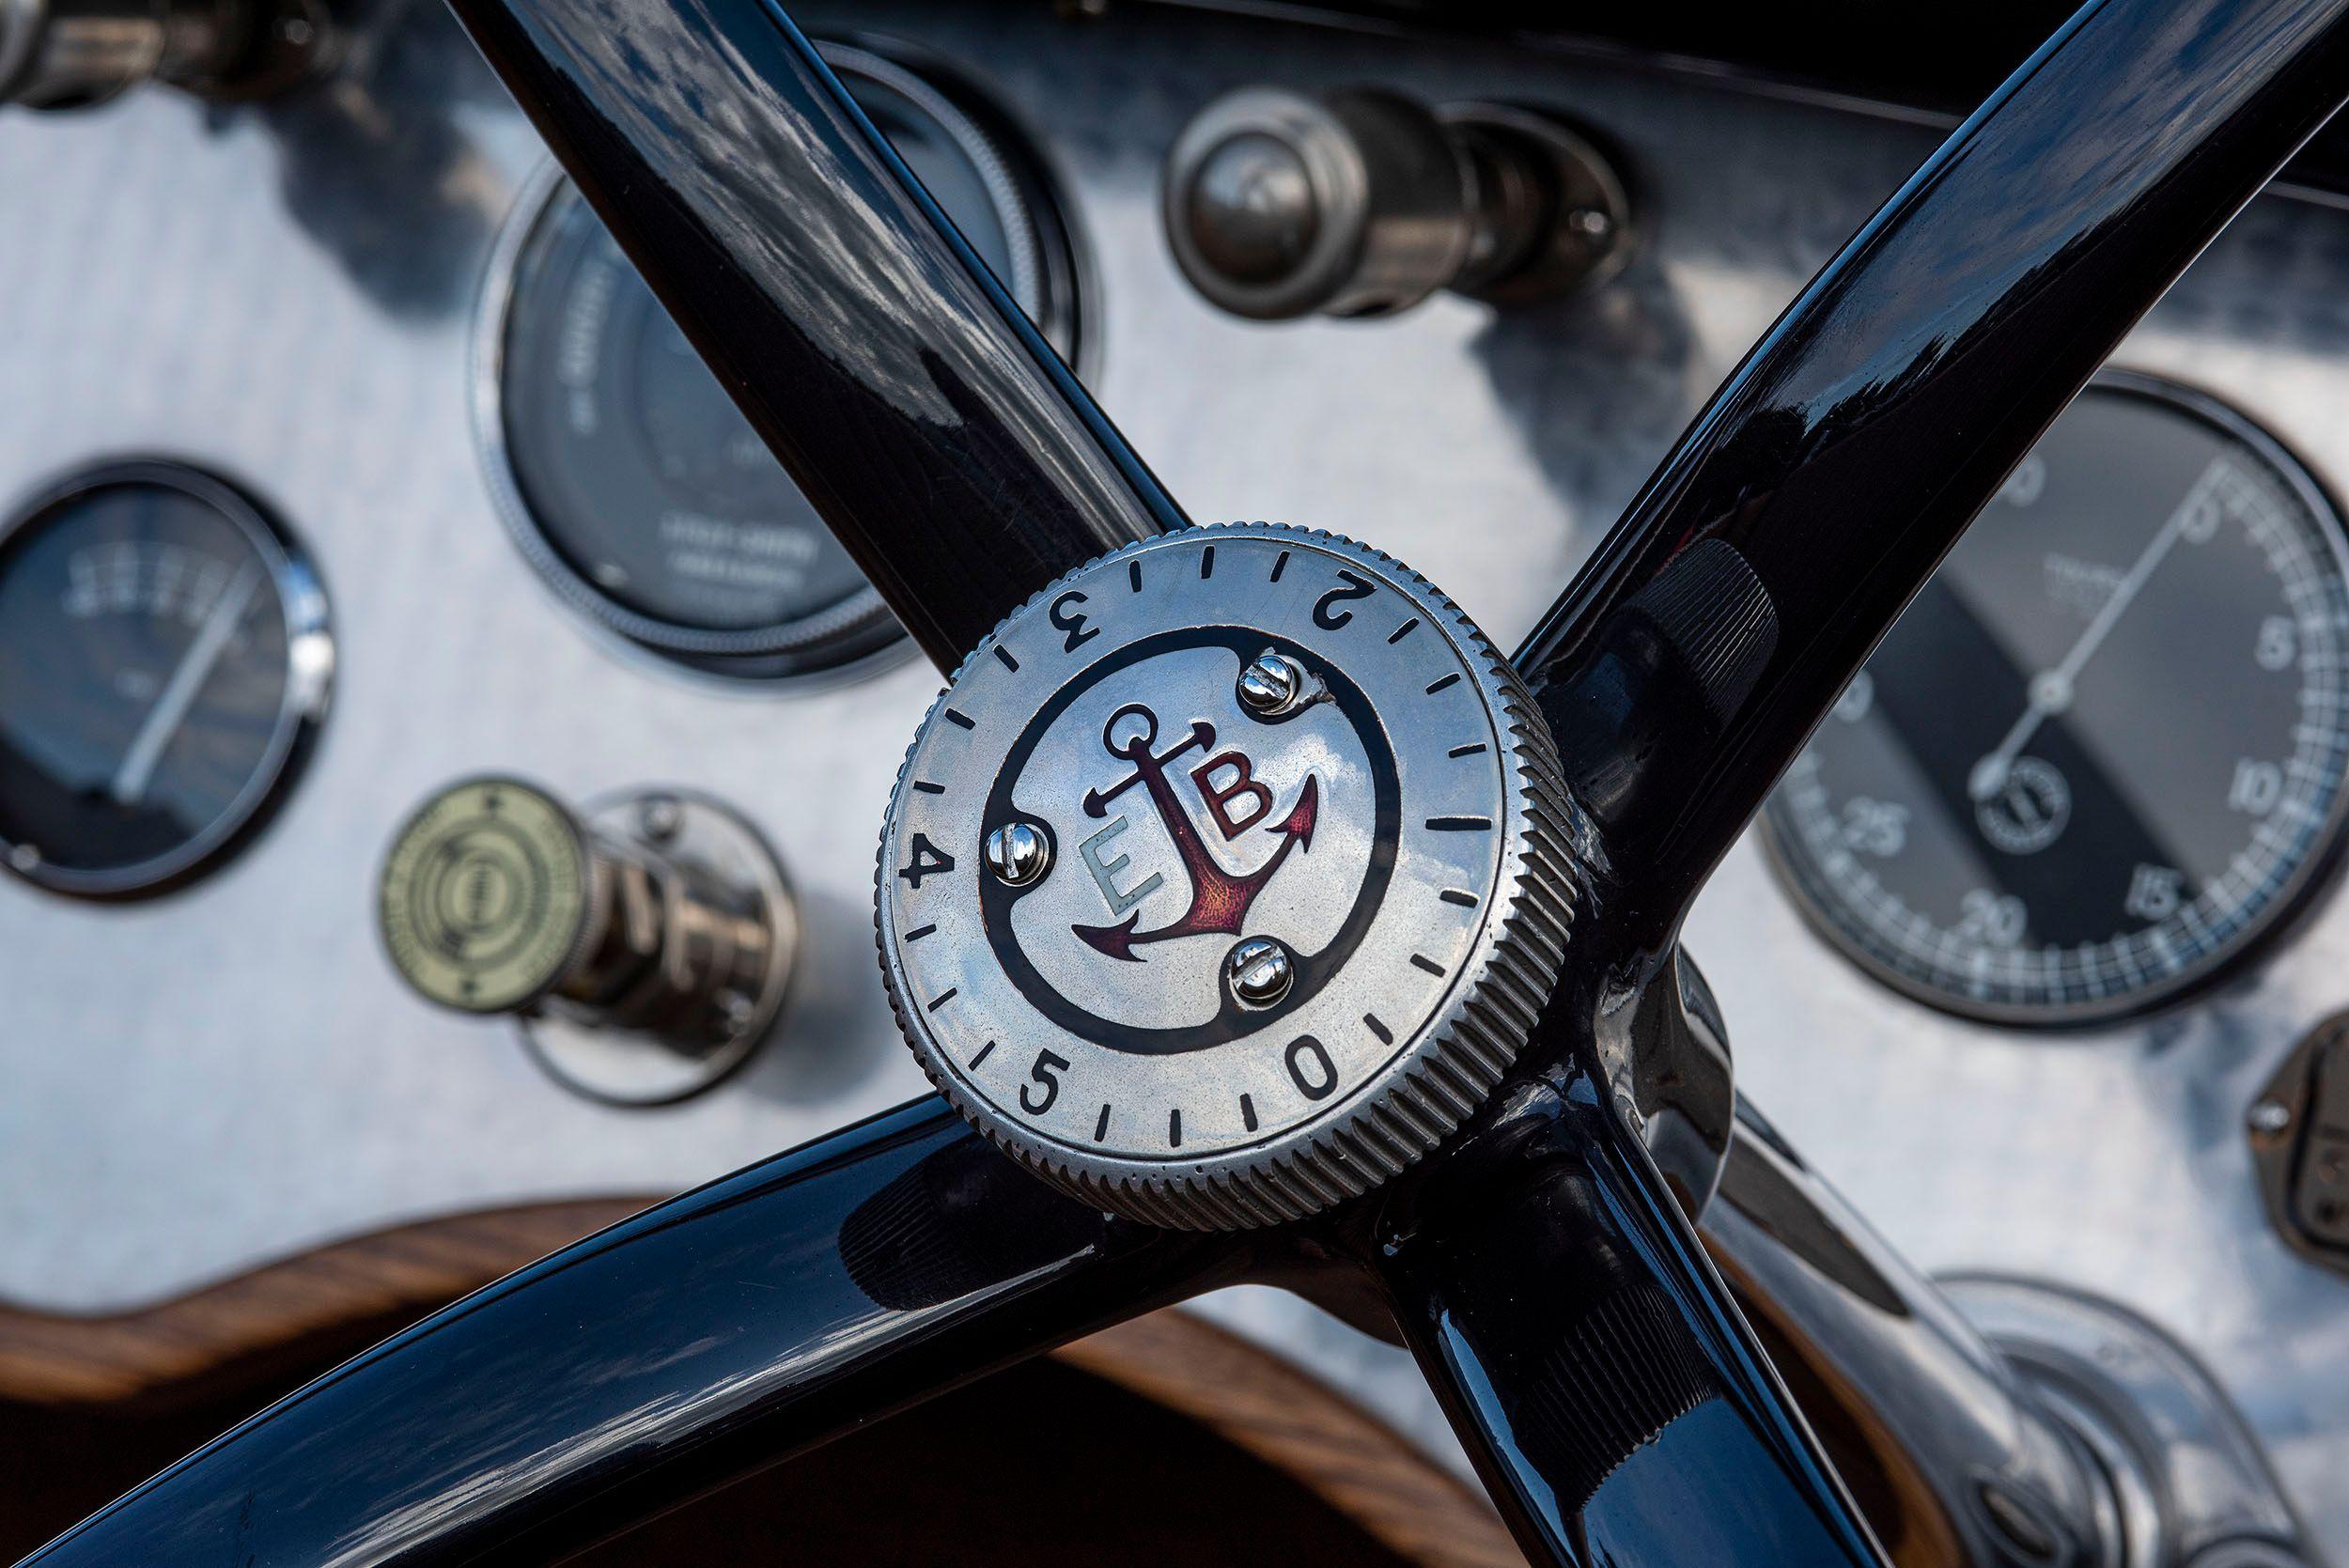 1931 Ballot RH3 steering wheel and dashboard.